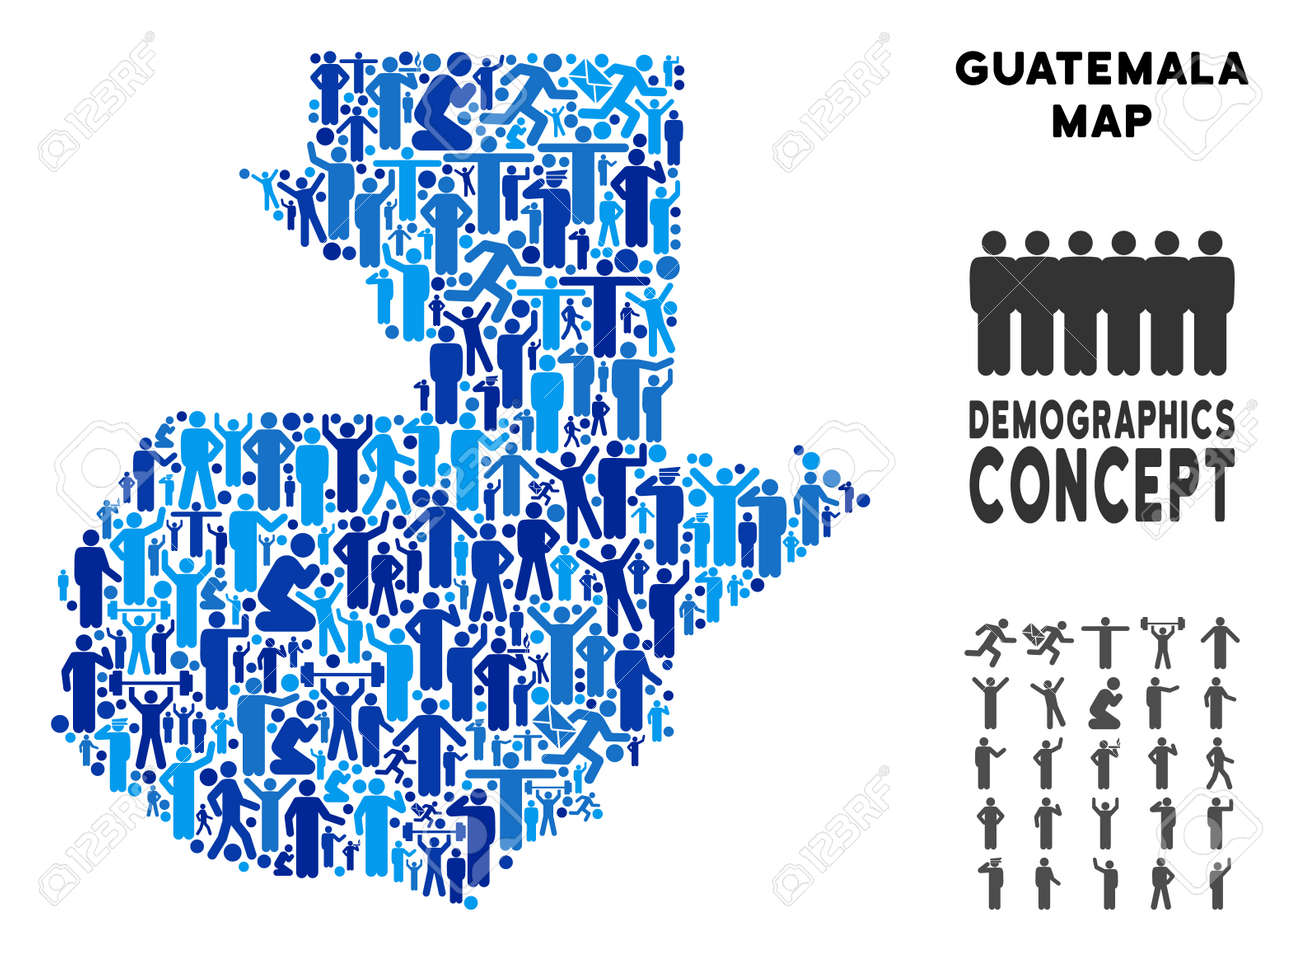 Vector Potion Guatemala Map. Demography Concept Of Guatemala ... on